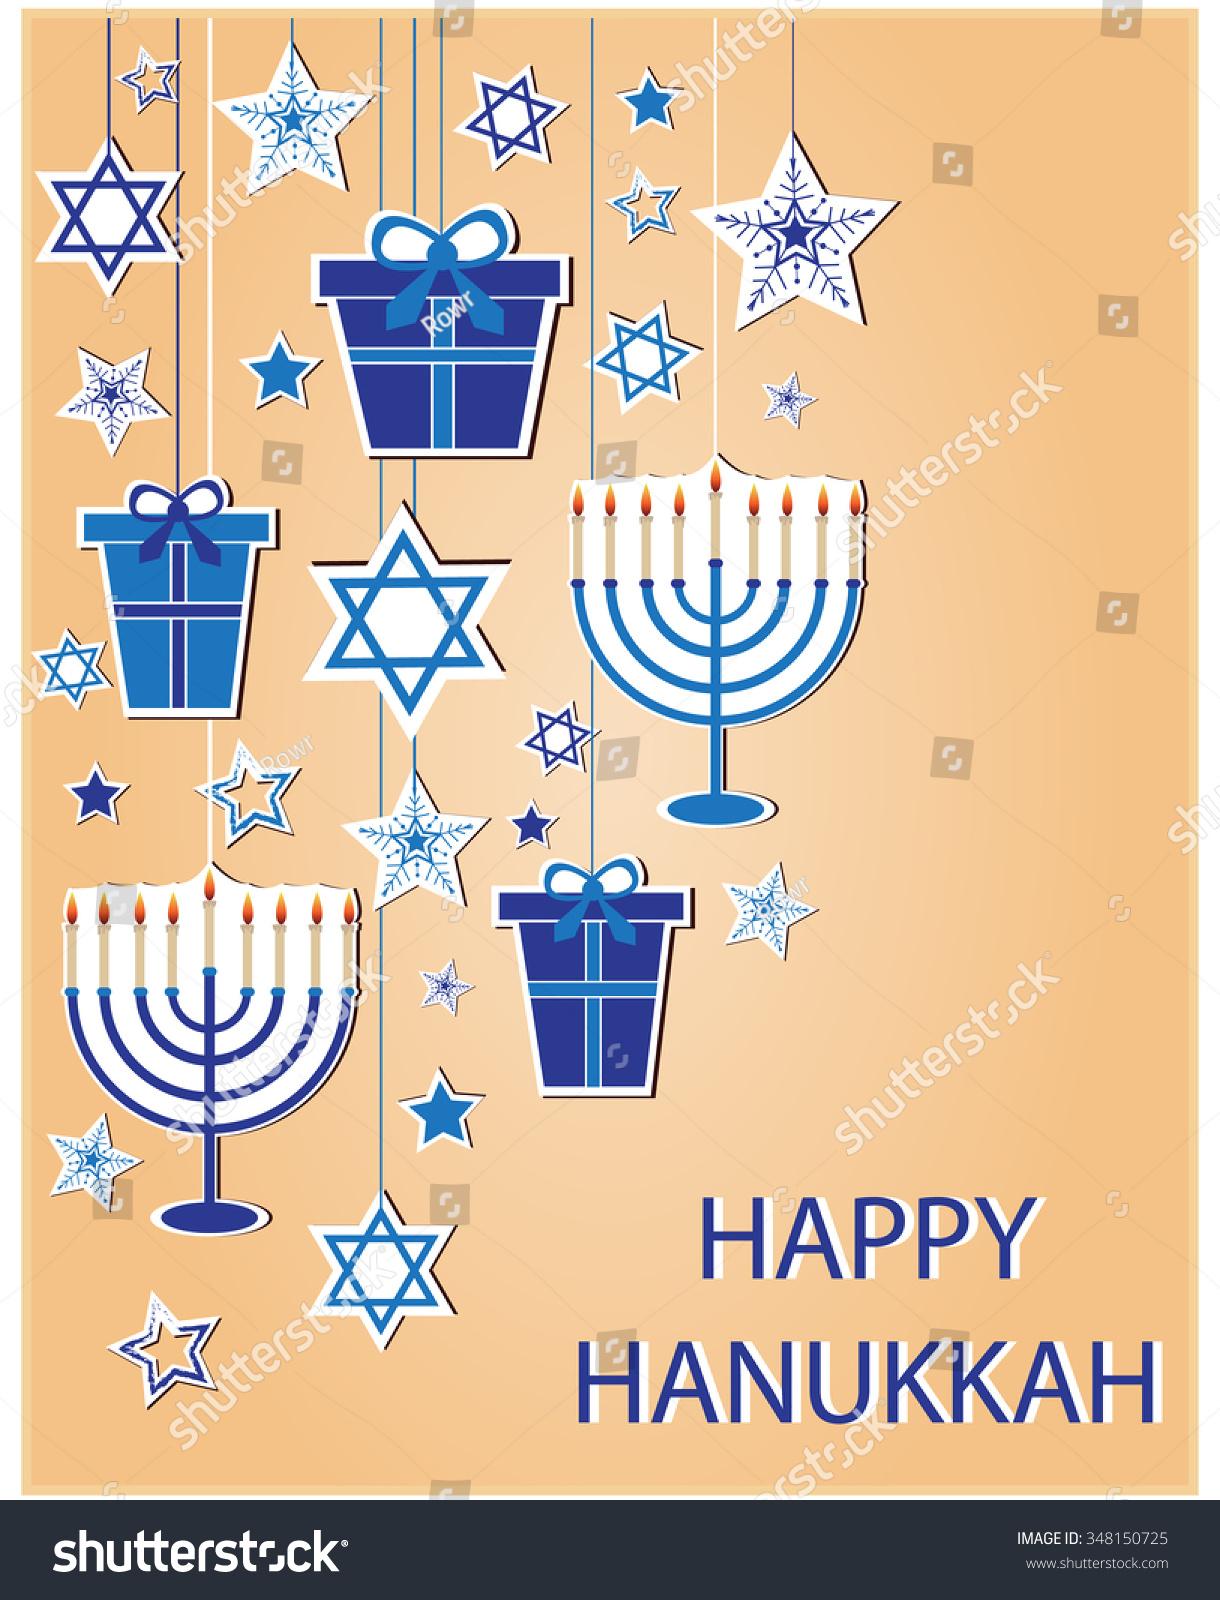 Happy Hanukkah Greeting Card Vector Lllustration Stock Vector